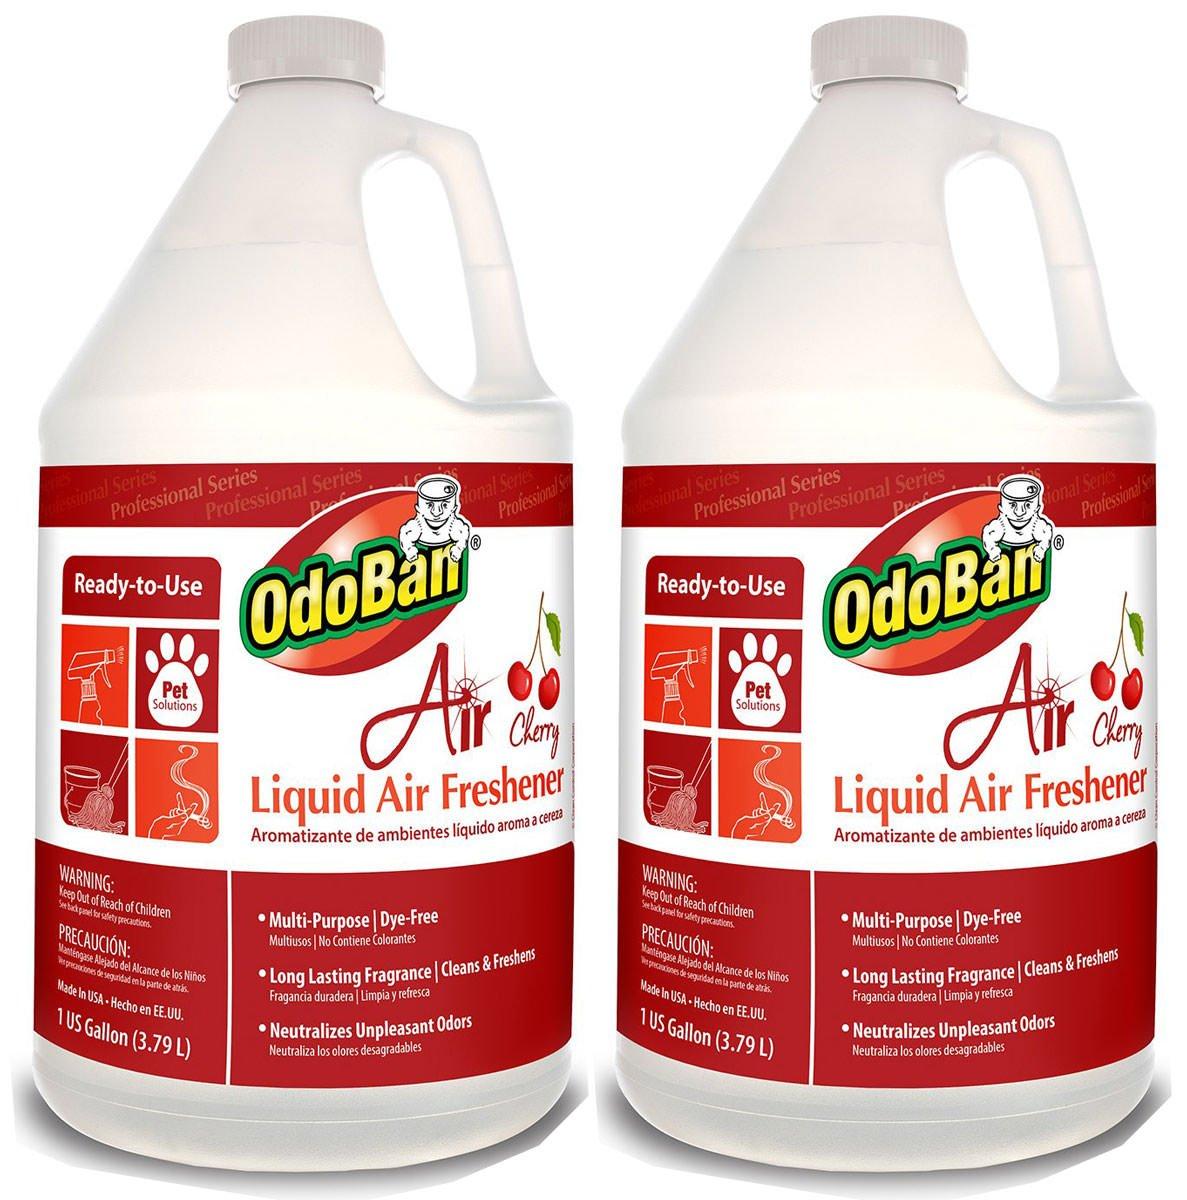 OdoBan 977362-G Air Cherry Liquid Air Freshener, 1 Gallon Bottle, 2 Pack